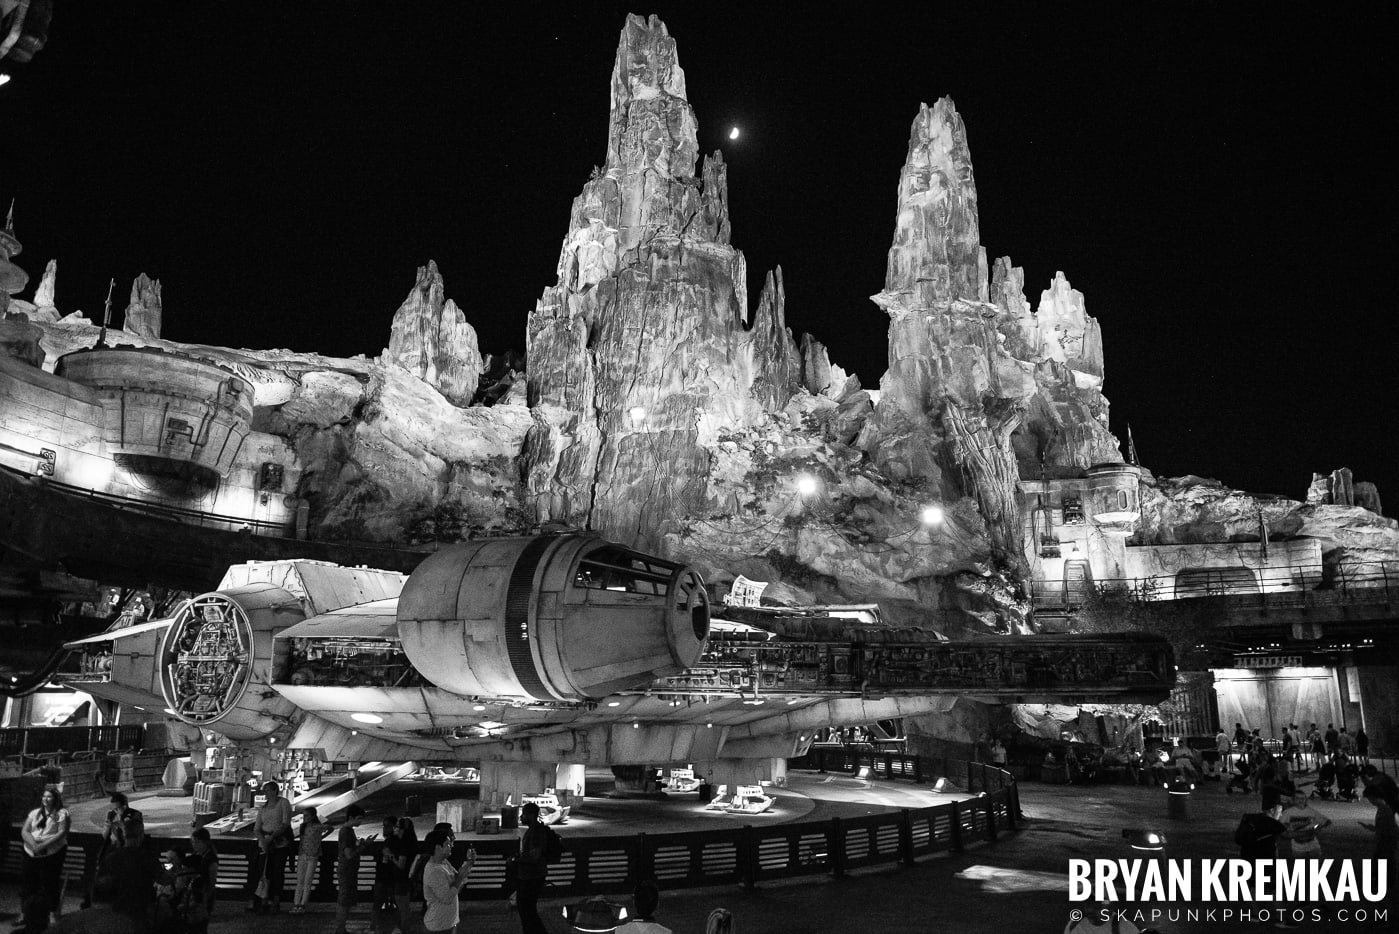 Walt Disney World Vacation: Day 6 (Magic Kingdom, Epcot, Disney's Hollywood Studios) - 10.4.19 (18)